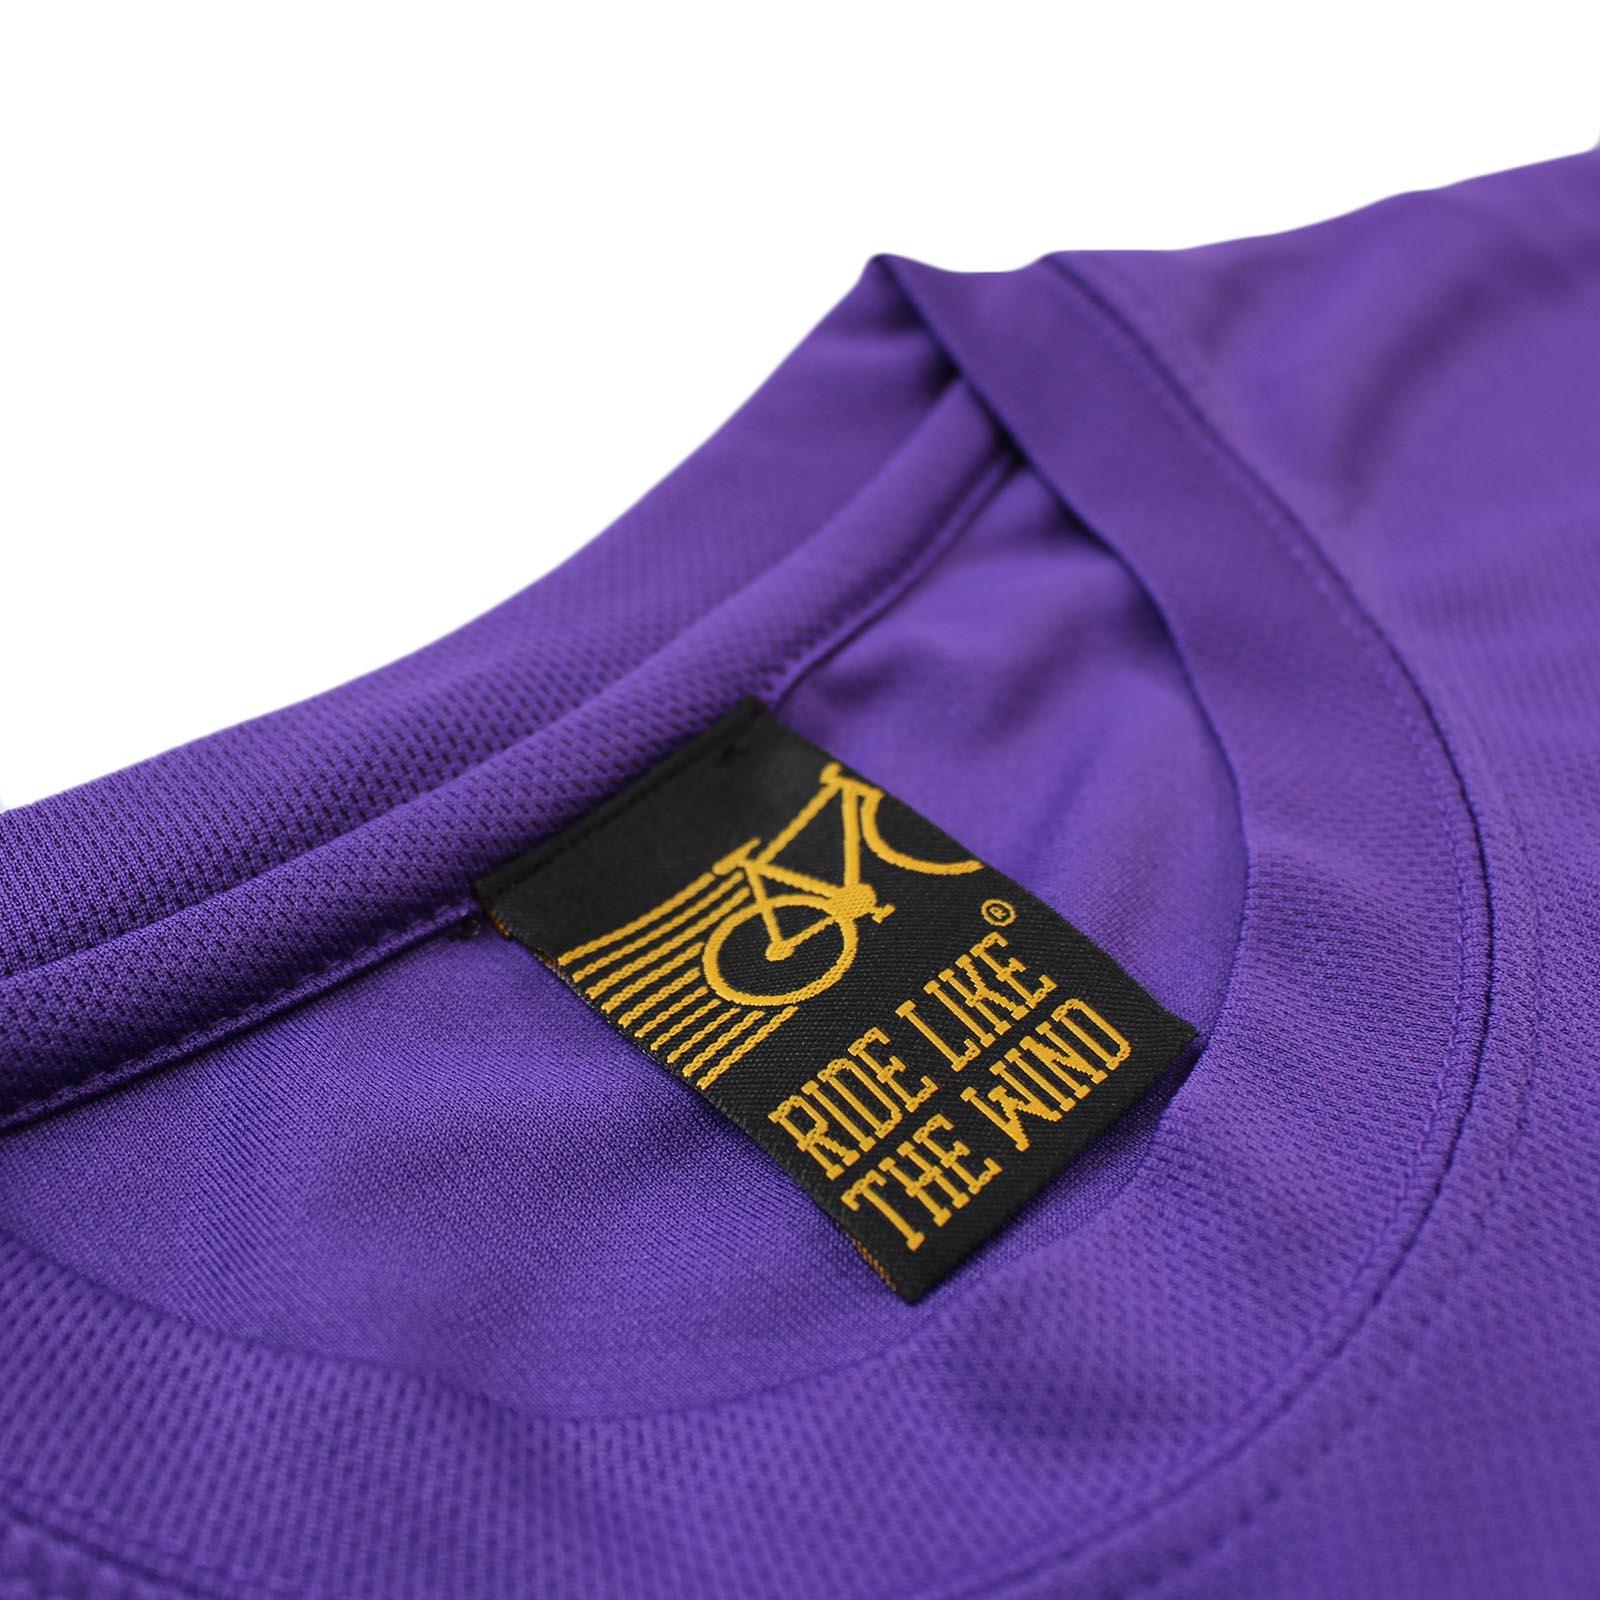 Kaleidospoke Cycling T-Shirt Funny Mens Sports Performance Tee